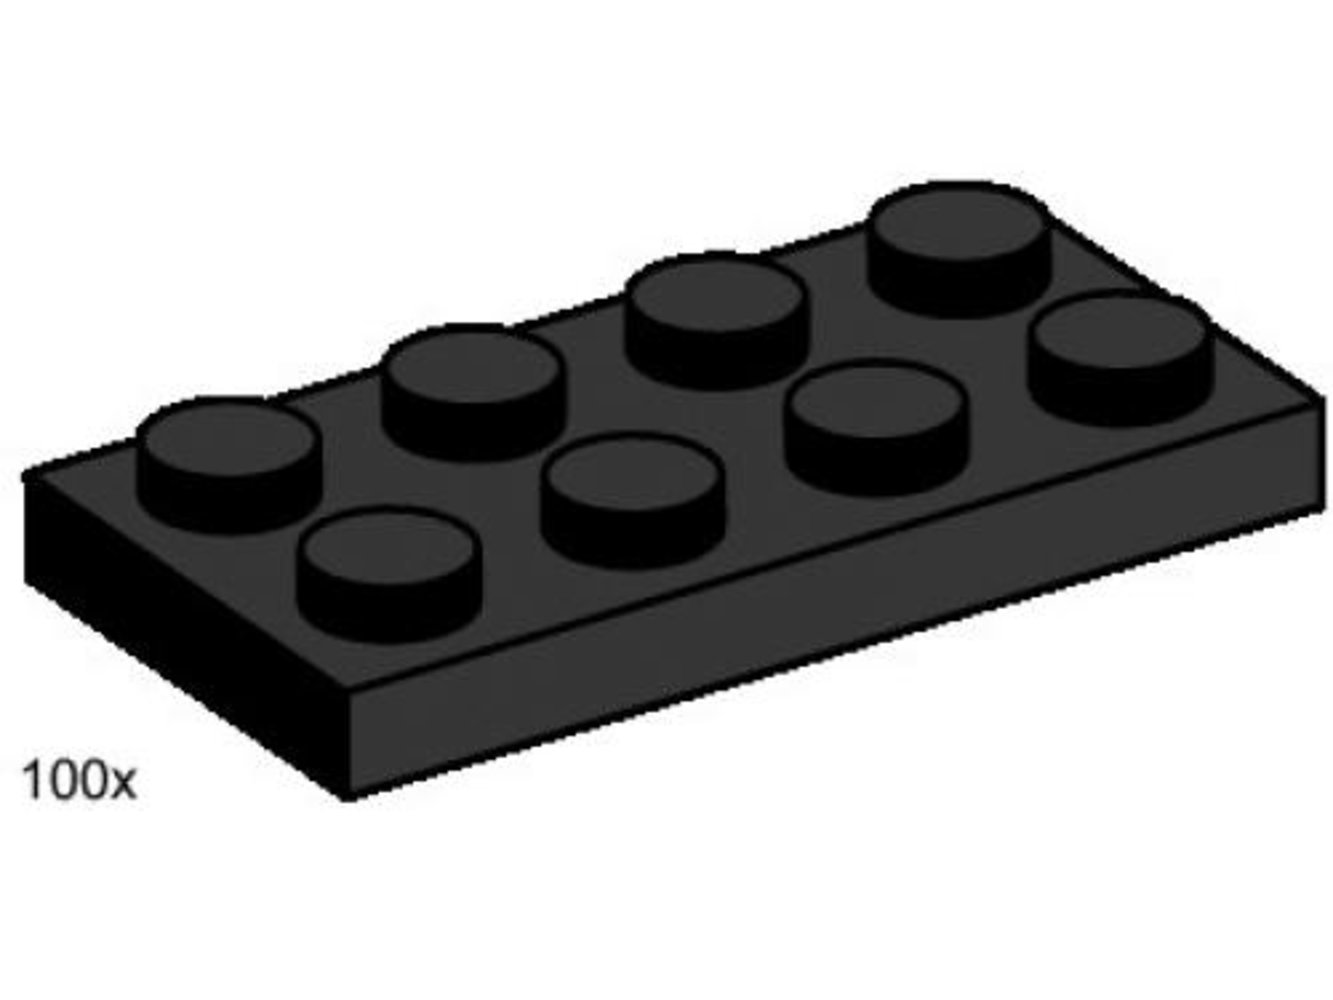 2 x 4 Black Plates